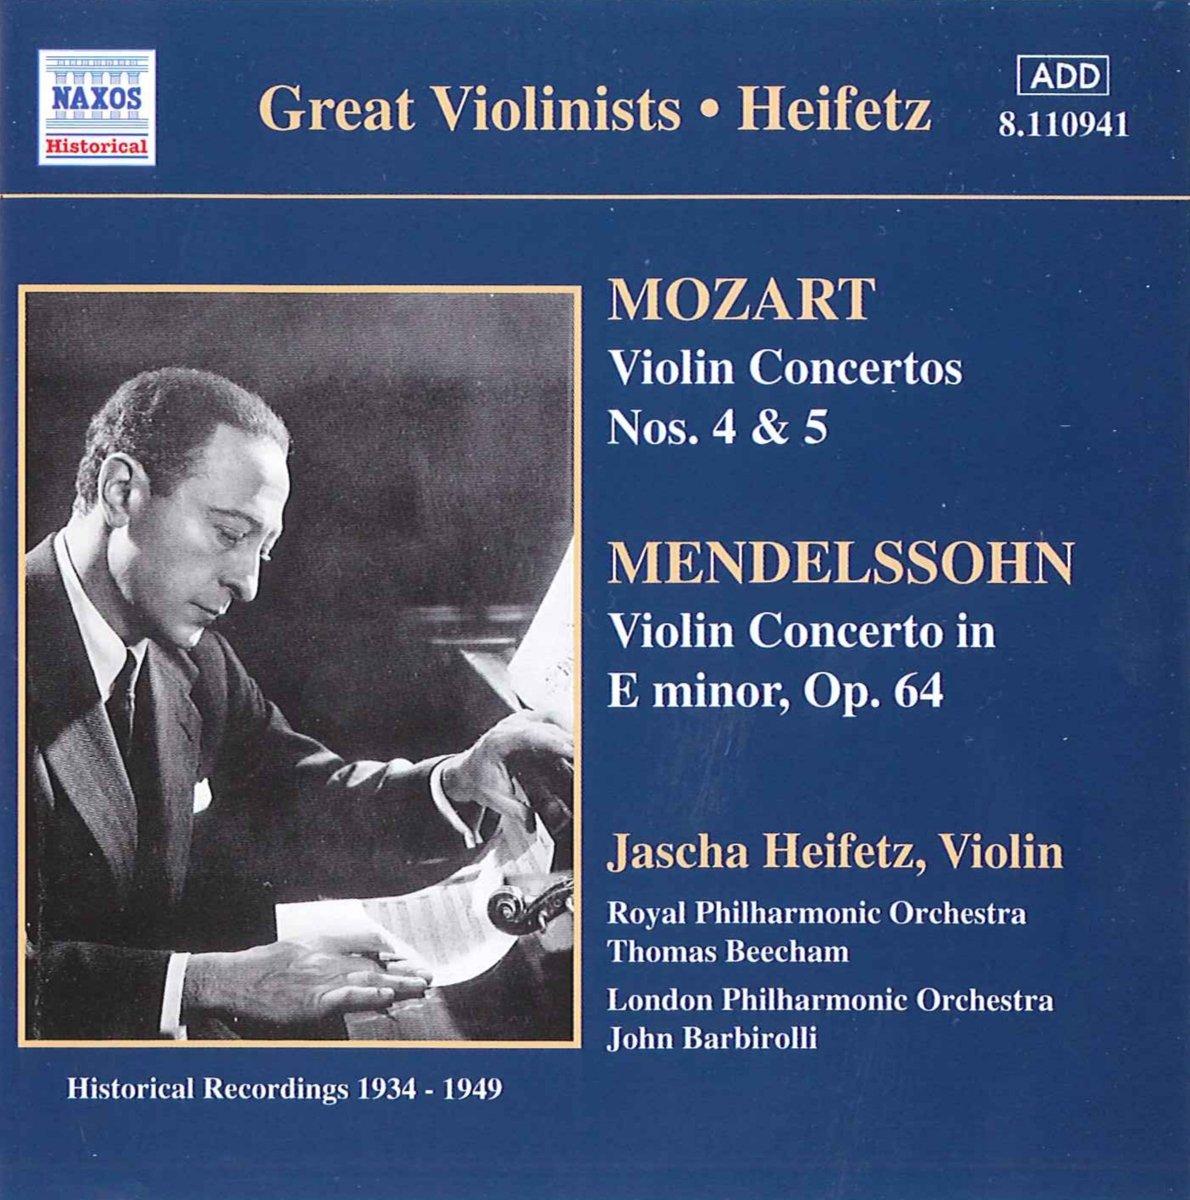 Mozart, Mendelssohn, Jascha Heifetz Great Violinists - Heifetz